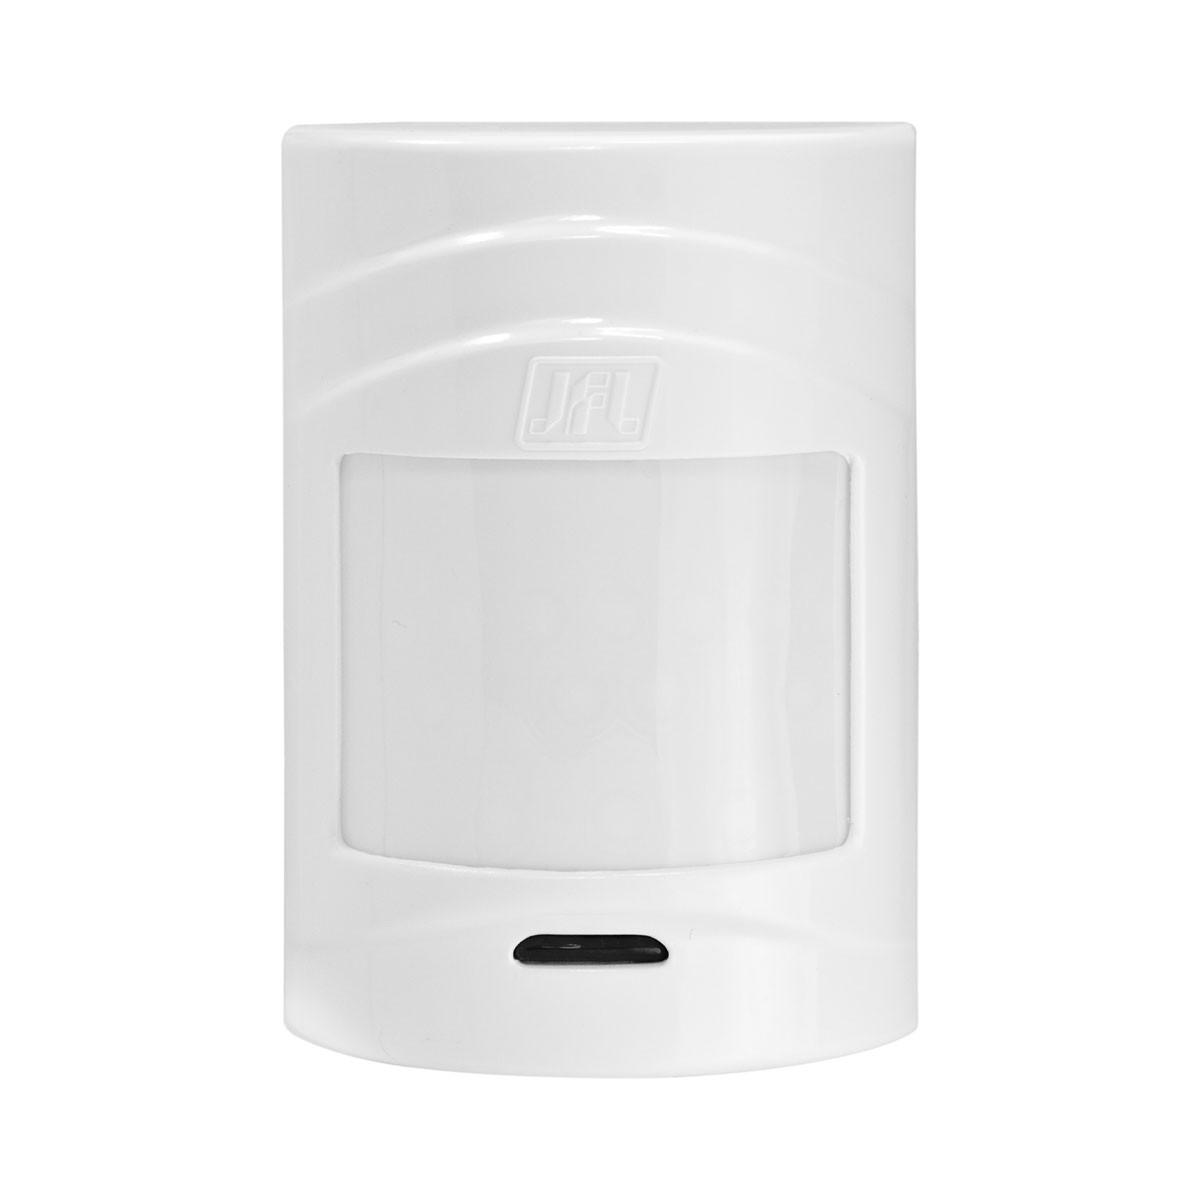 Kit Alarme Active 20 Gprs Sensores Sem Fio IrPet 530 e Shc Fit